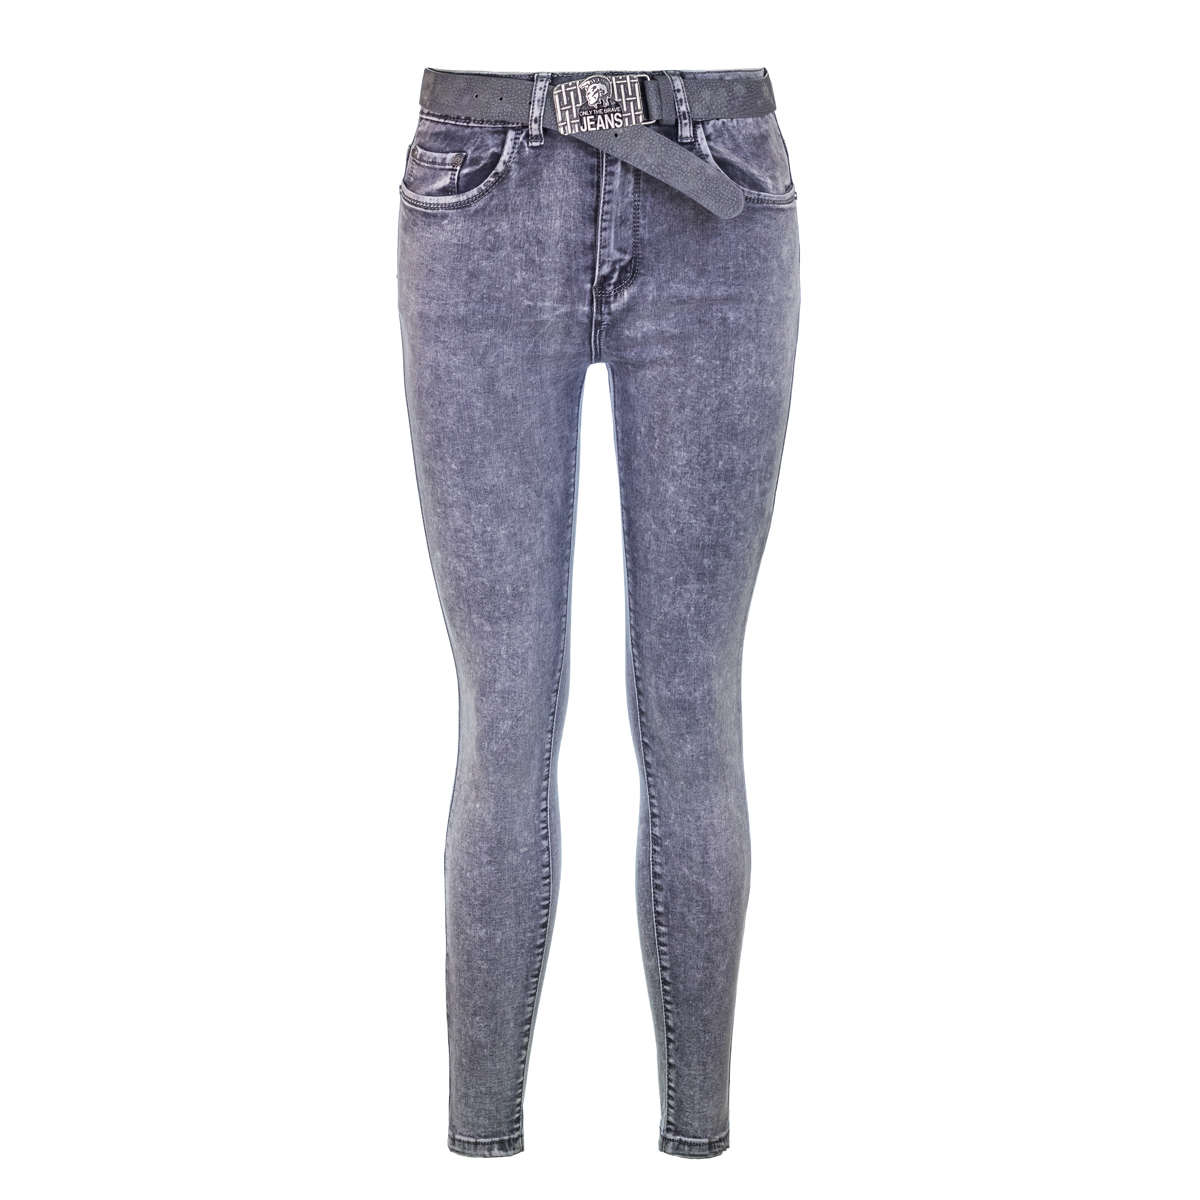 Жен. джинсы арт. 12-0087 Серый р. 31